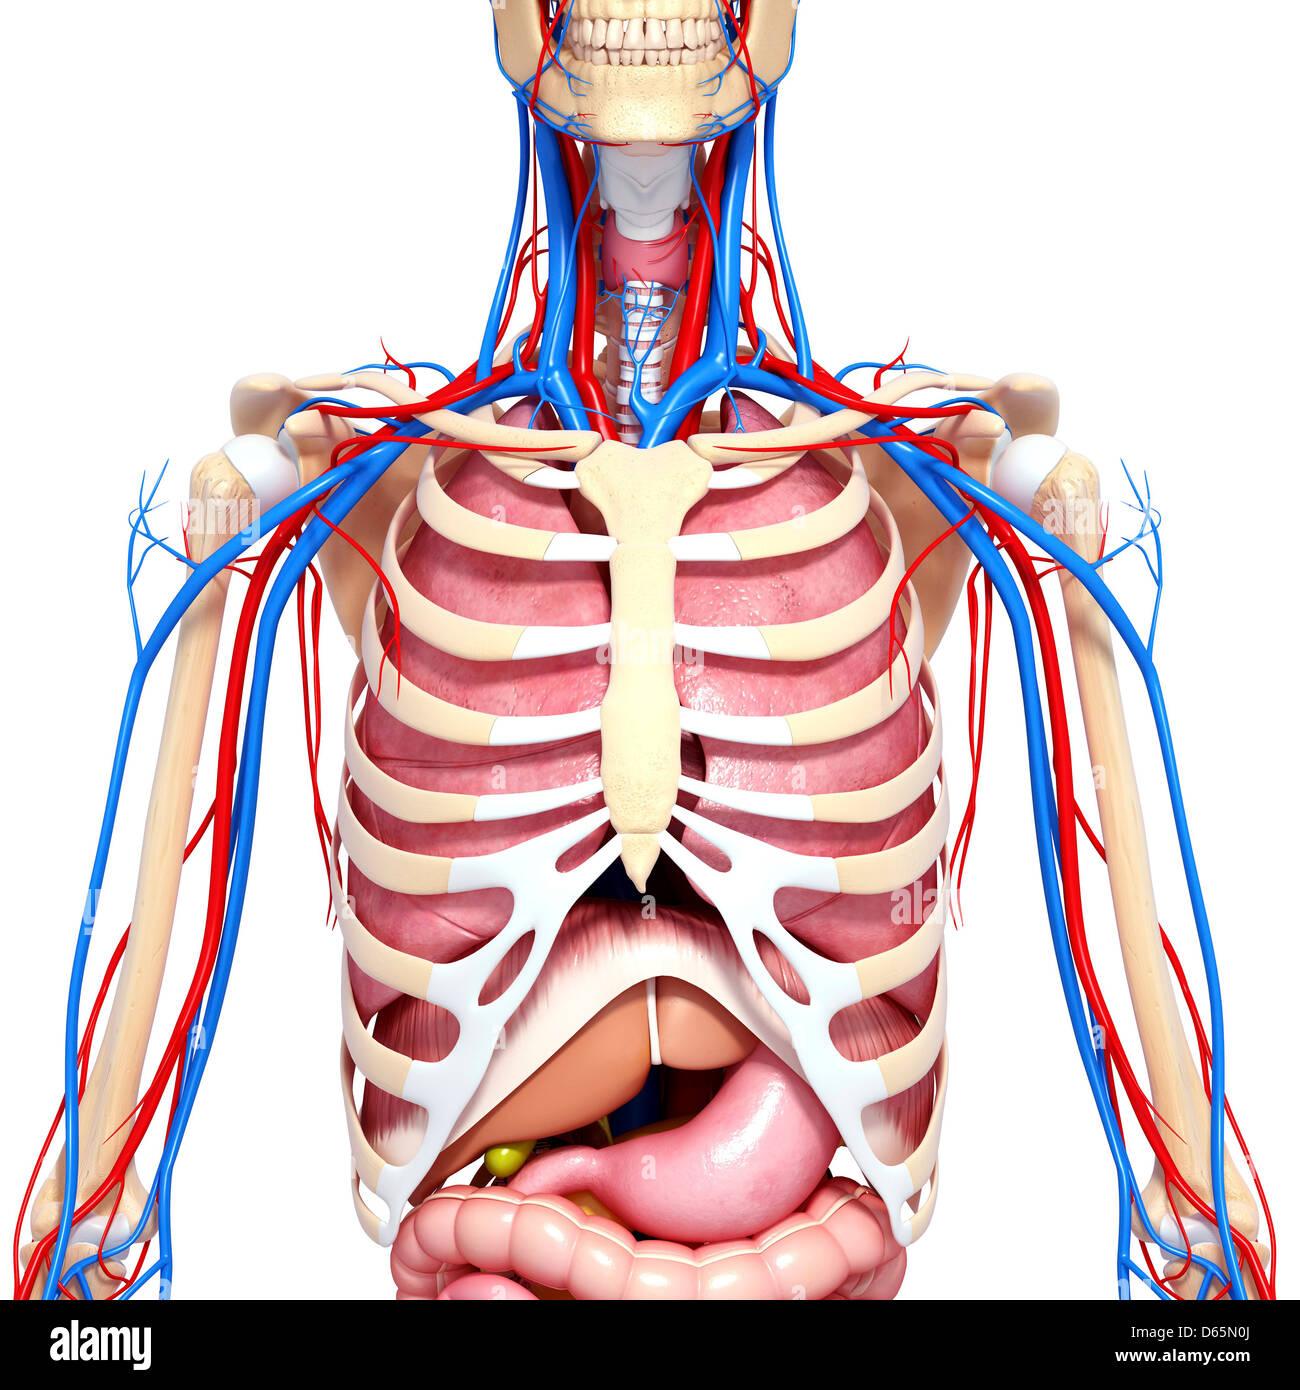 Upper Body Anatomy Stock Photos Upper Body Anatomy Stock Images